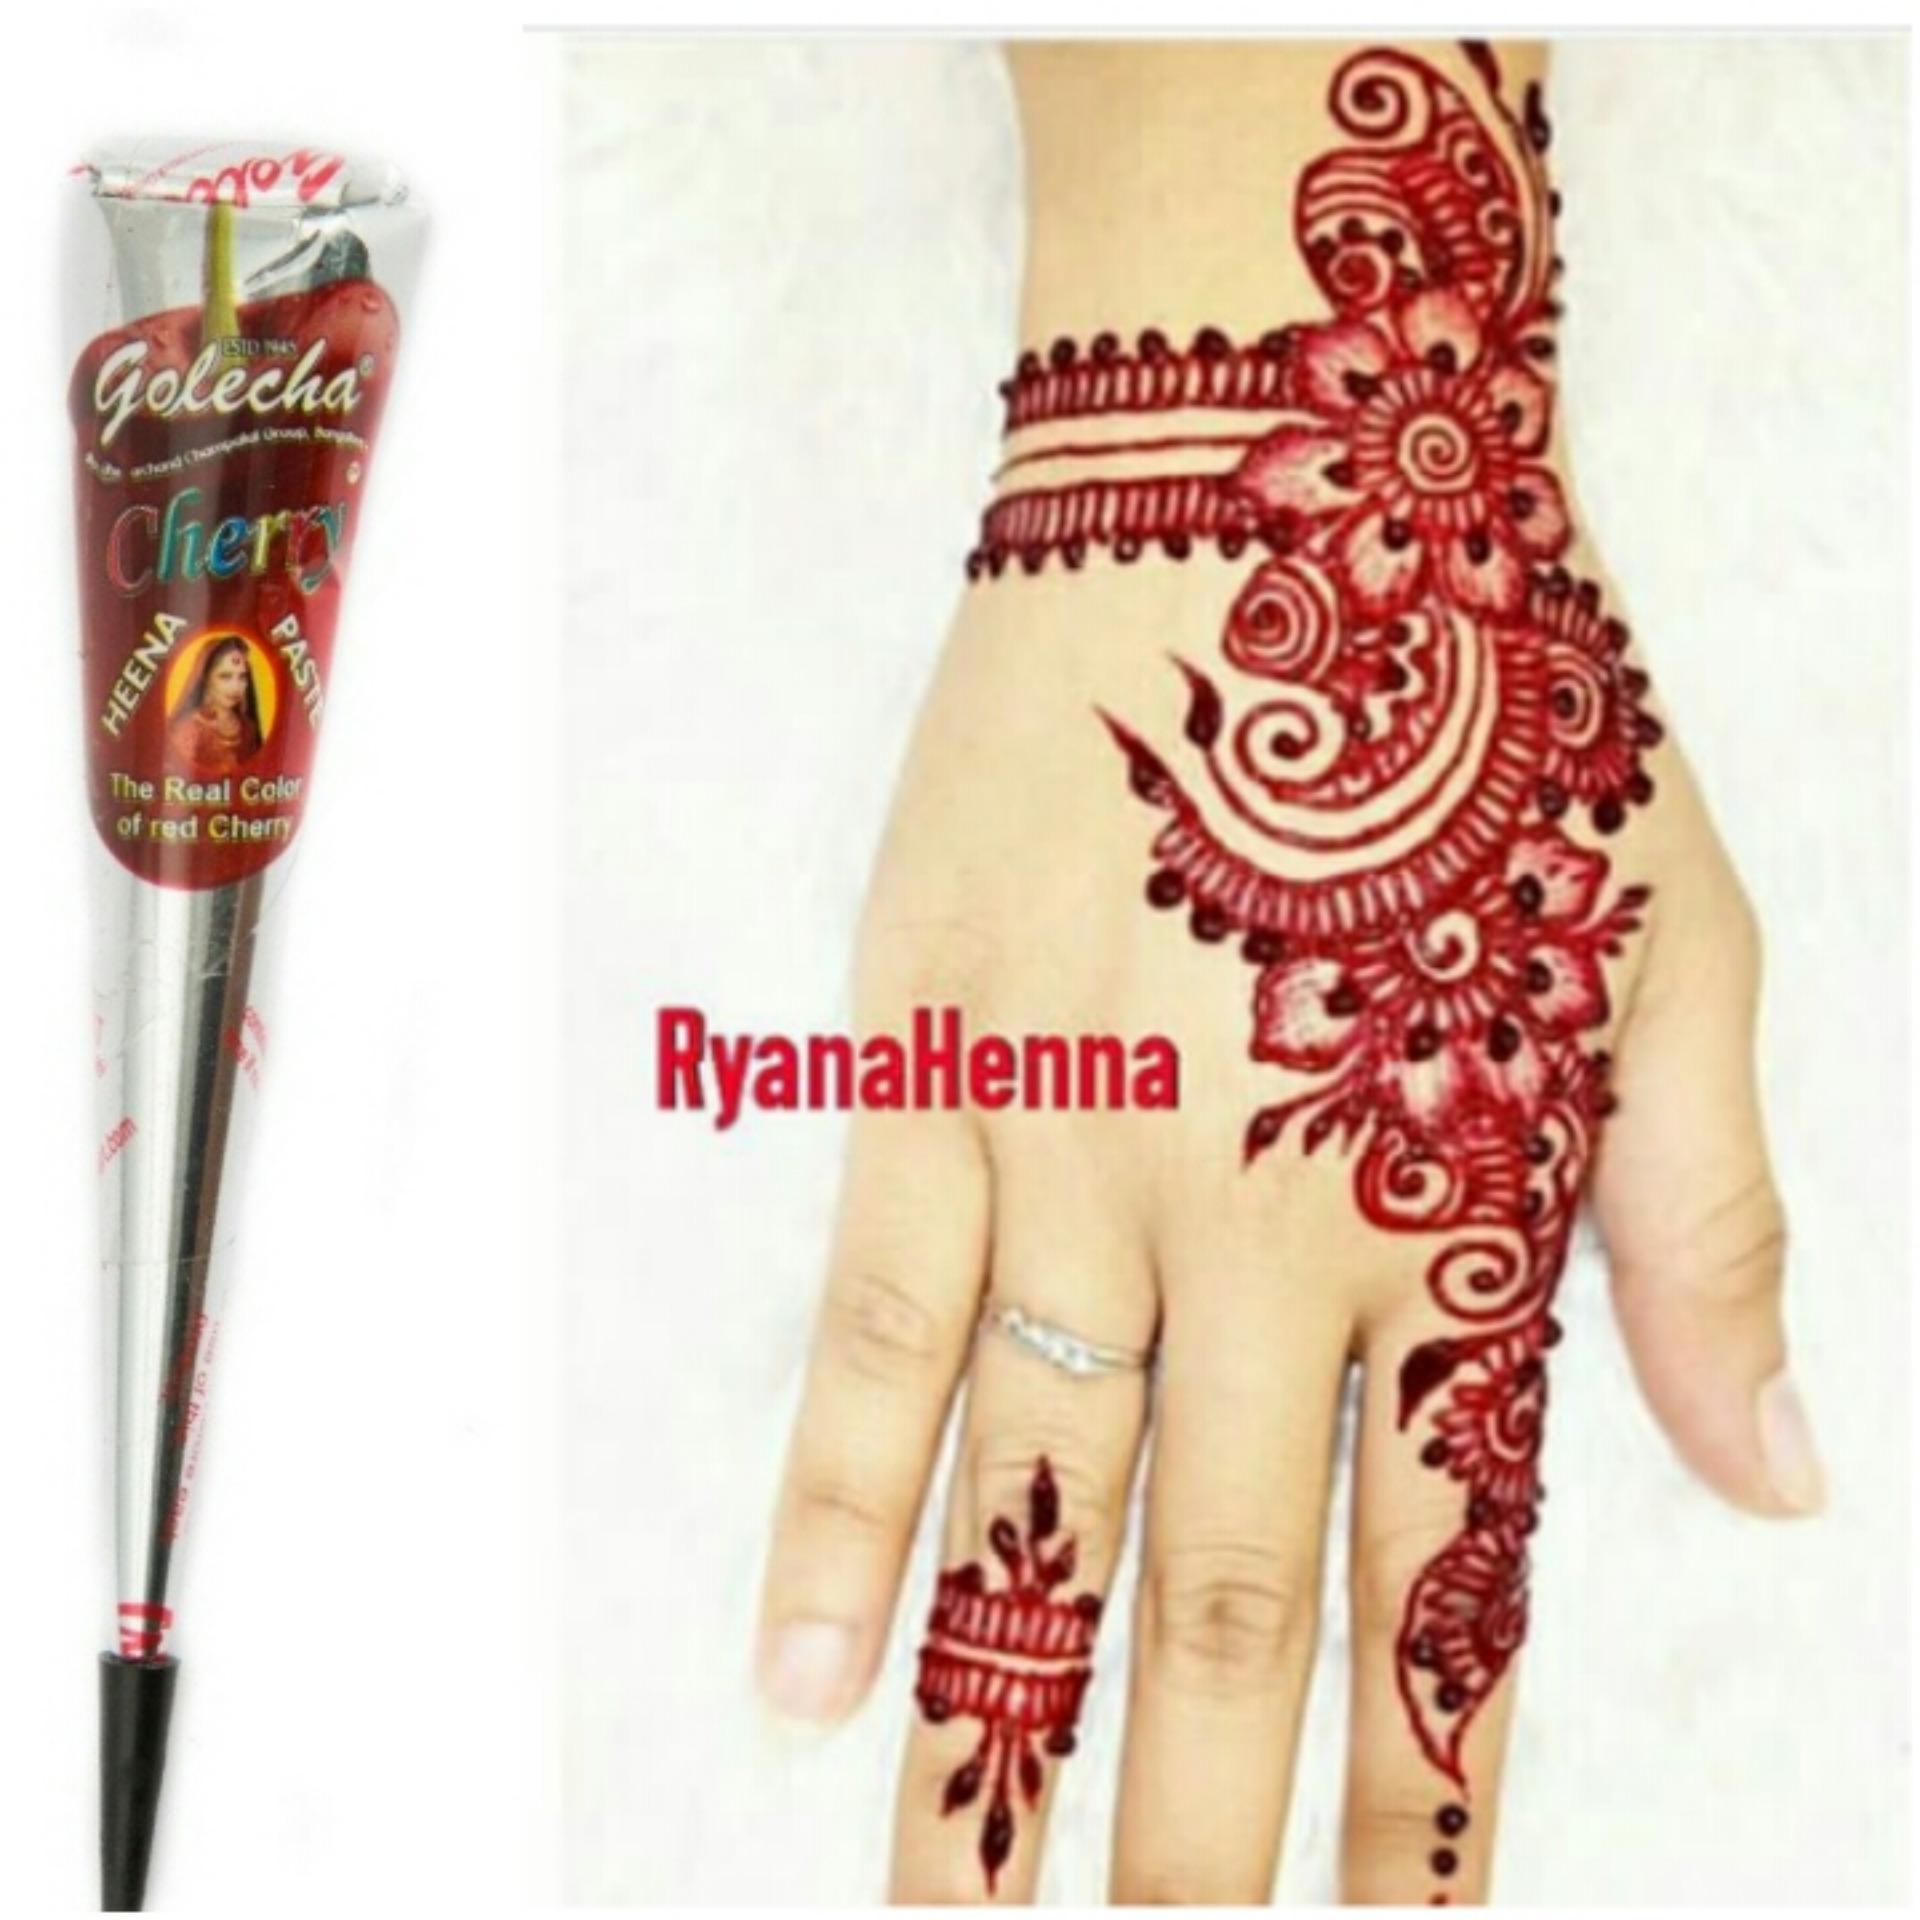 Diskon Penjualan Paket Hemat Henna Golecha Black Dan Red Chery 1